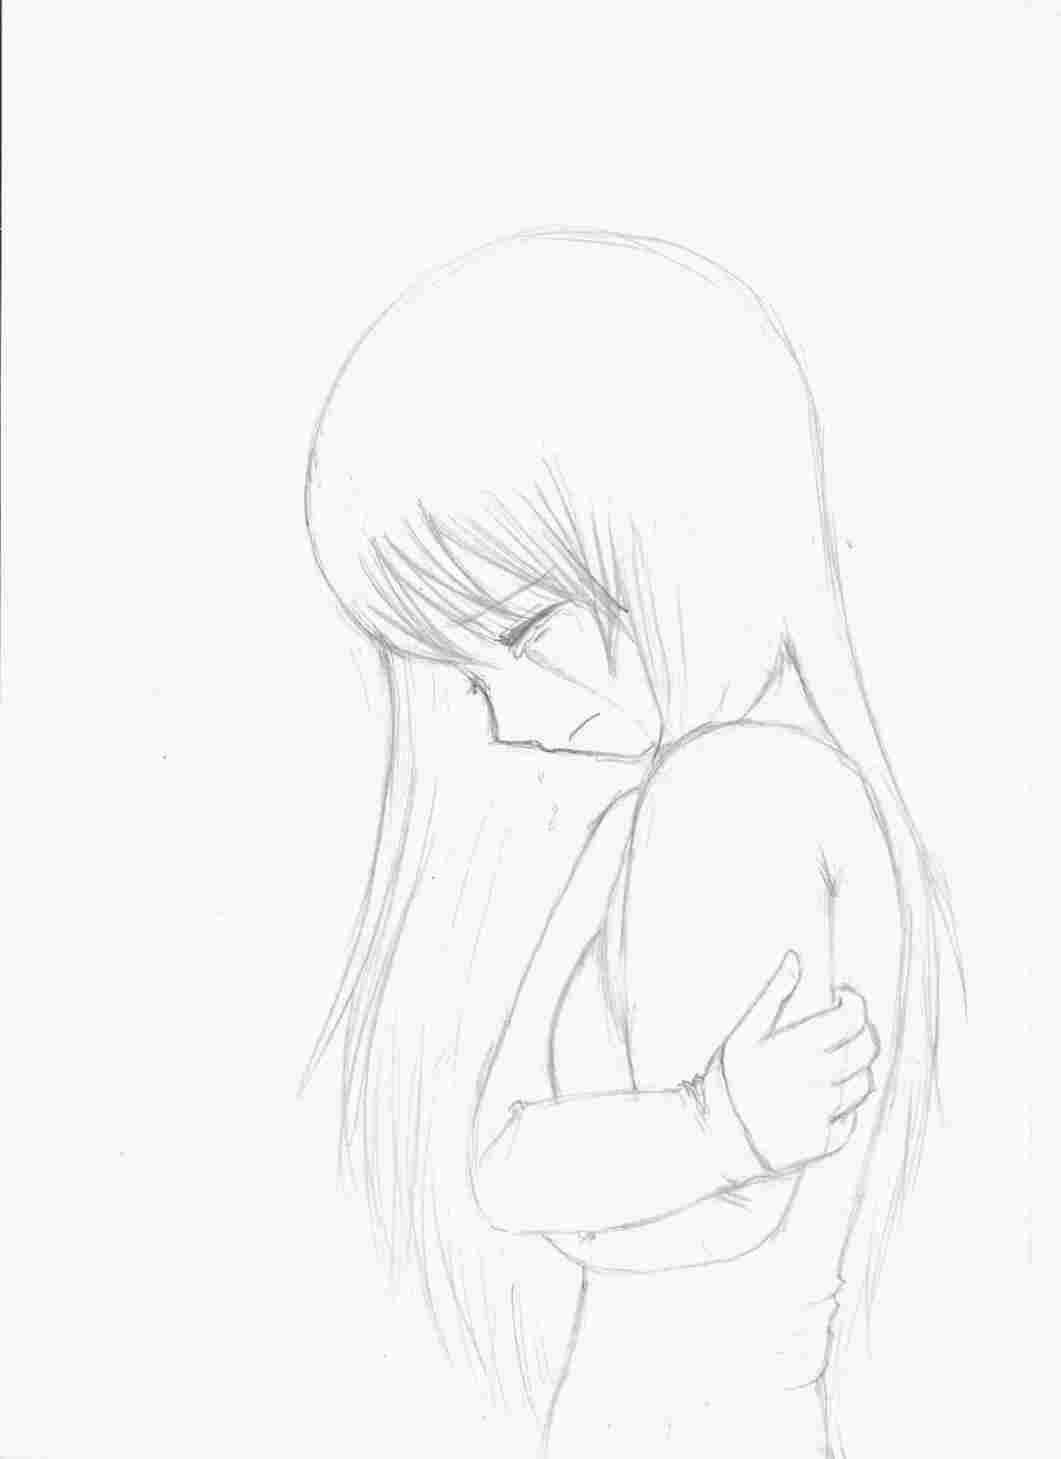 Anime Drawing Full Body Anime Couple Full Body Dibujos Como